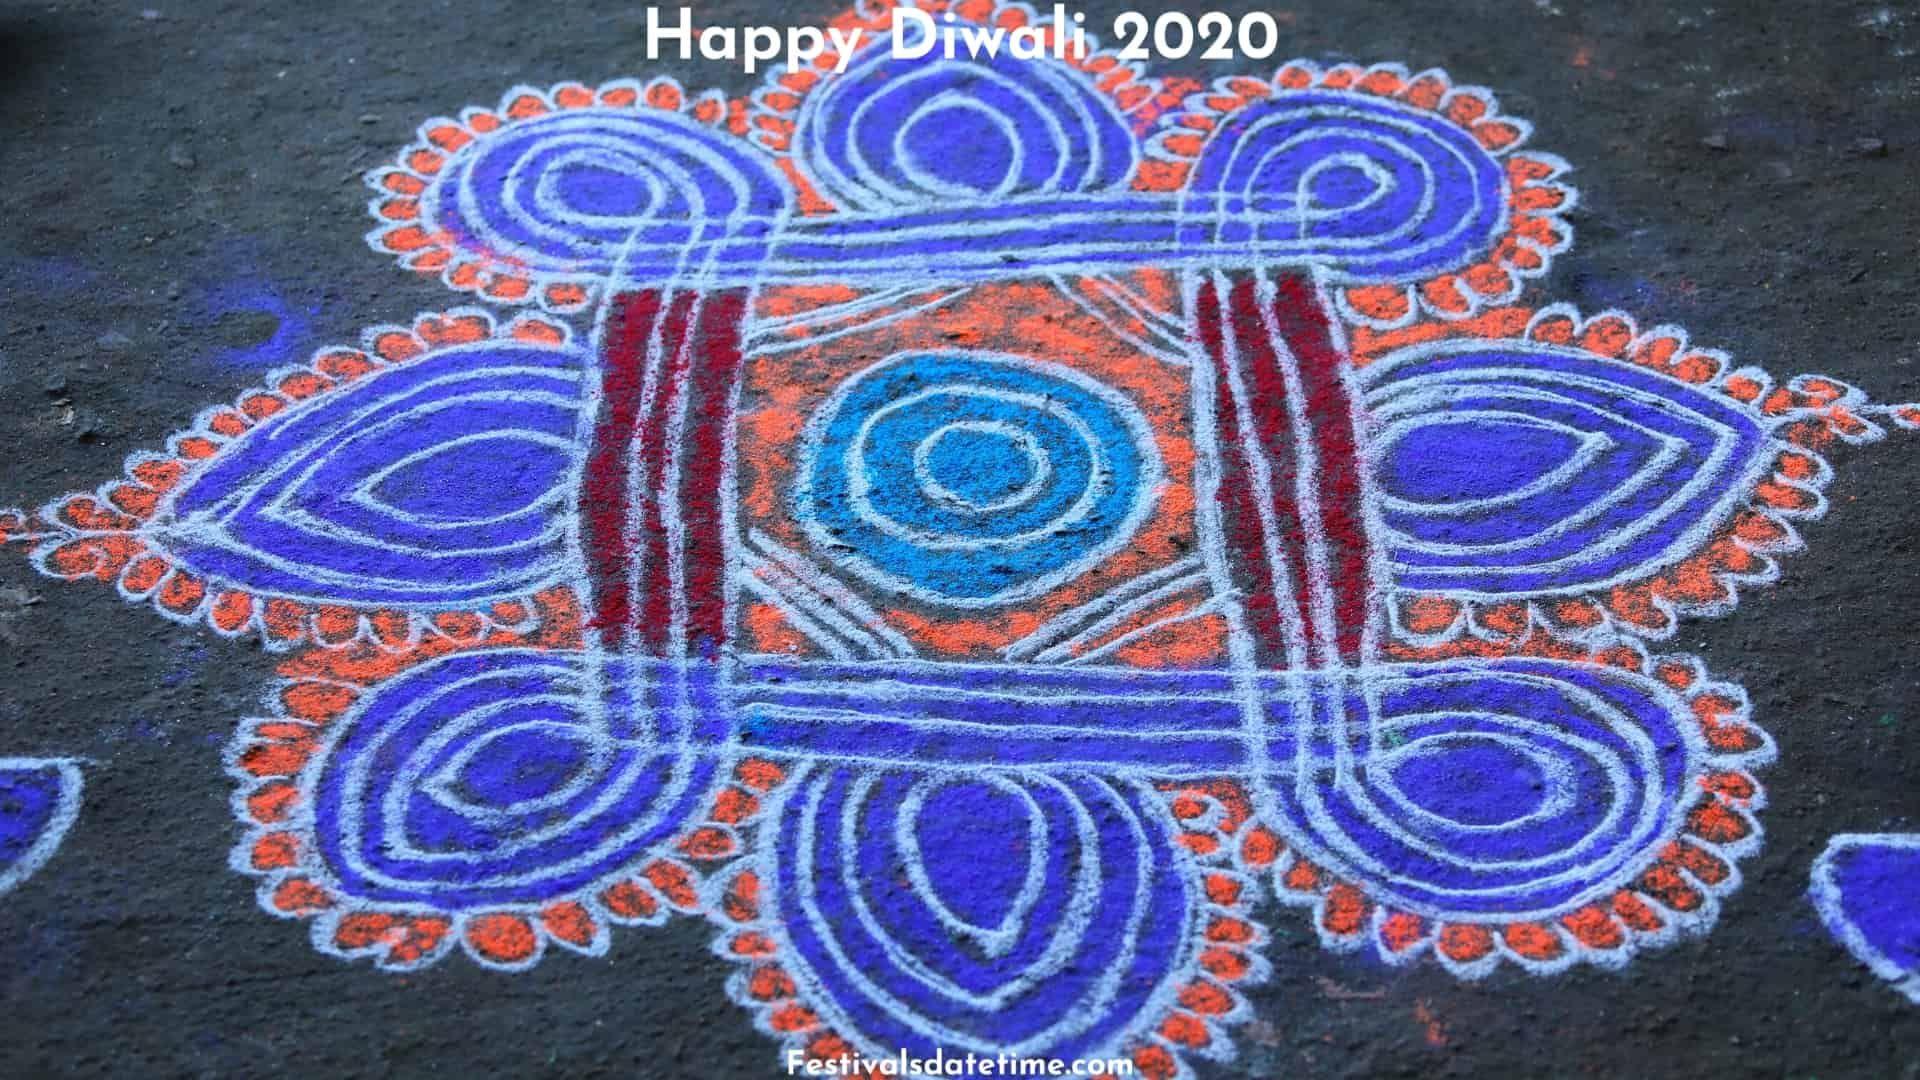 Rangoli Designs For Diwali 2020 in 2020 Rangoli designs